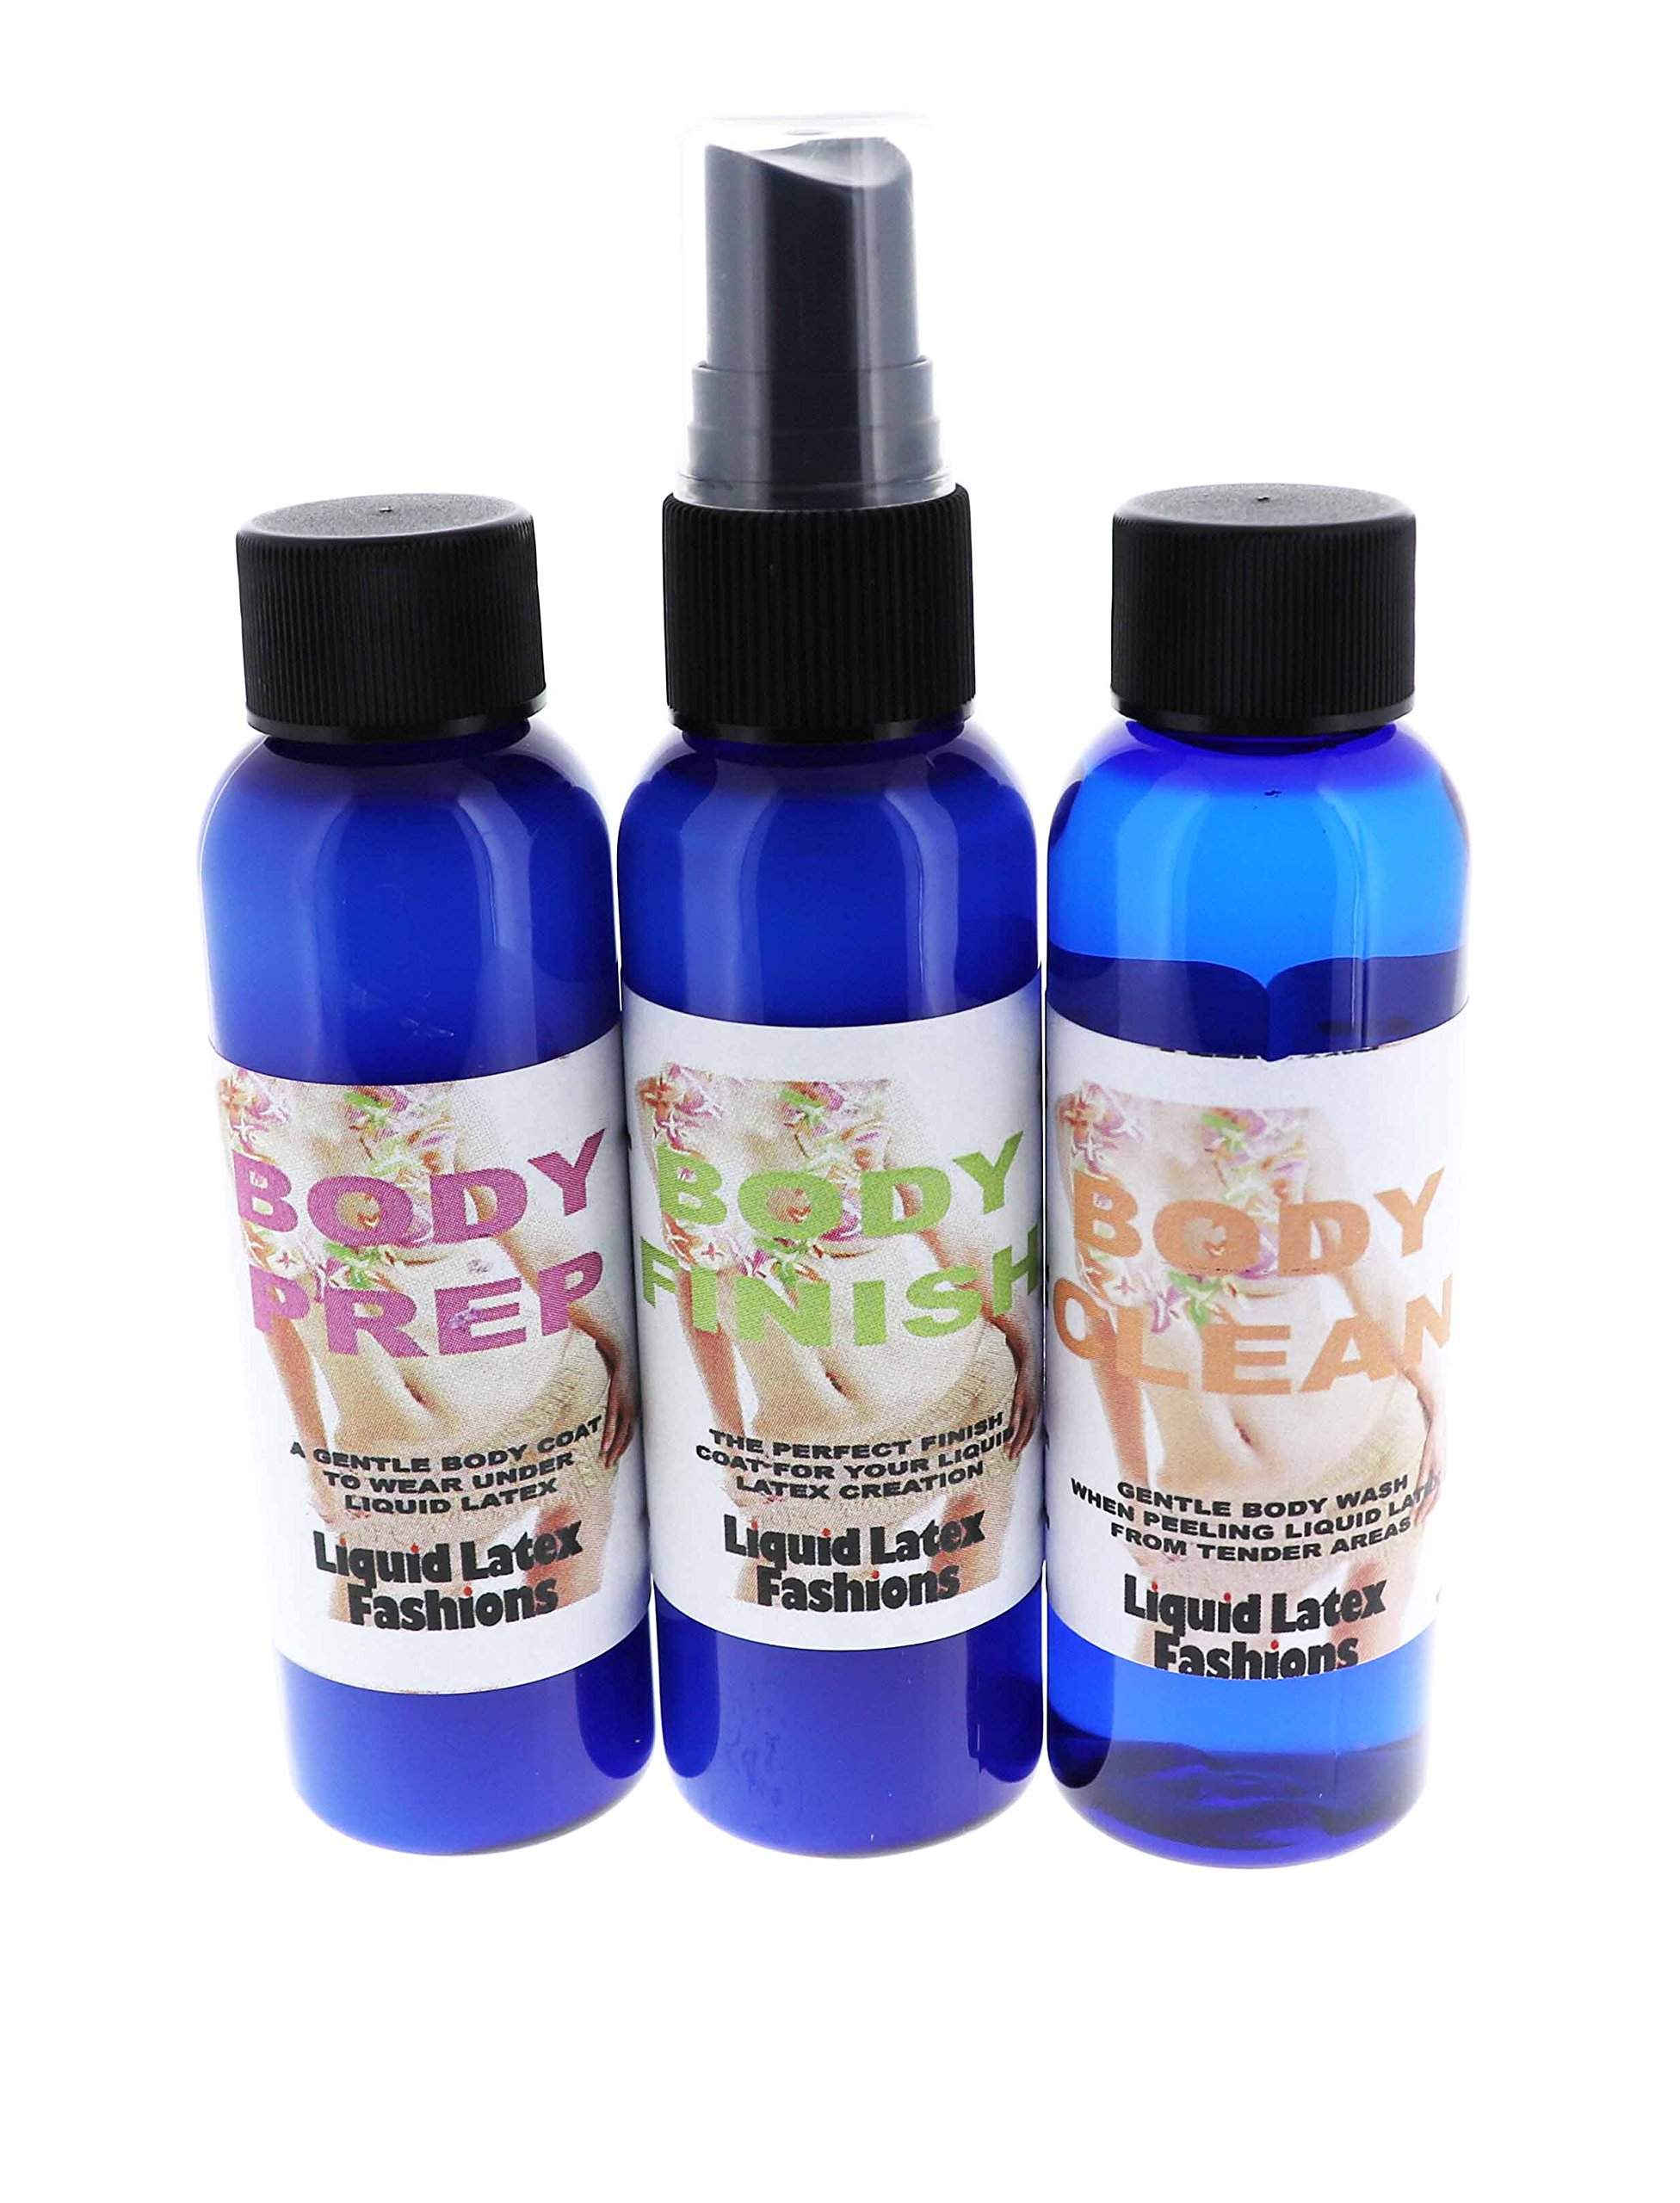 Liquid Latex Fashions Body Prep, Clean and Finishing Spray, 3 Bottles